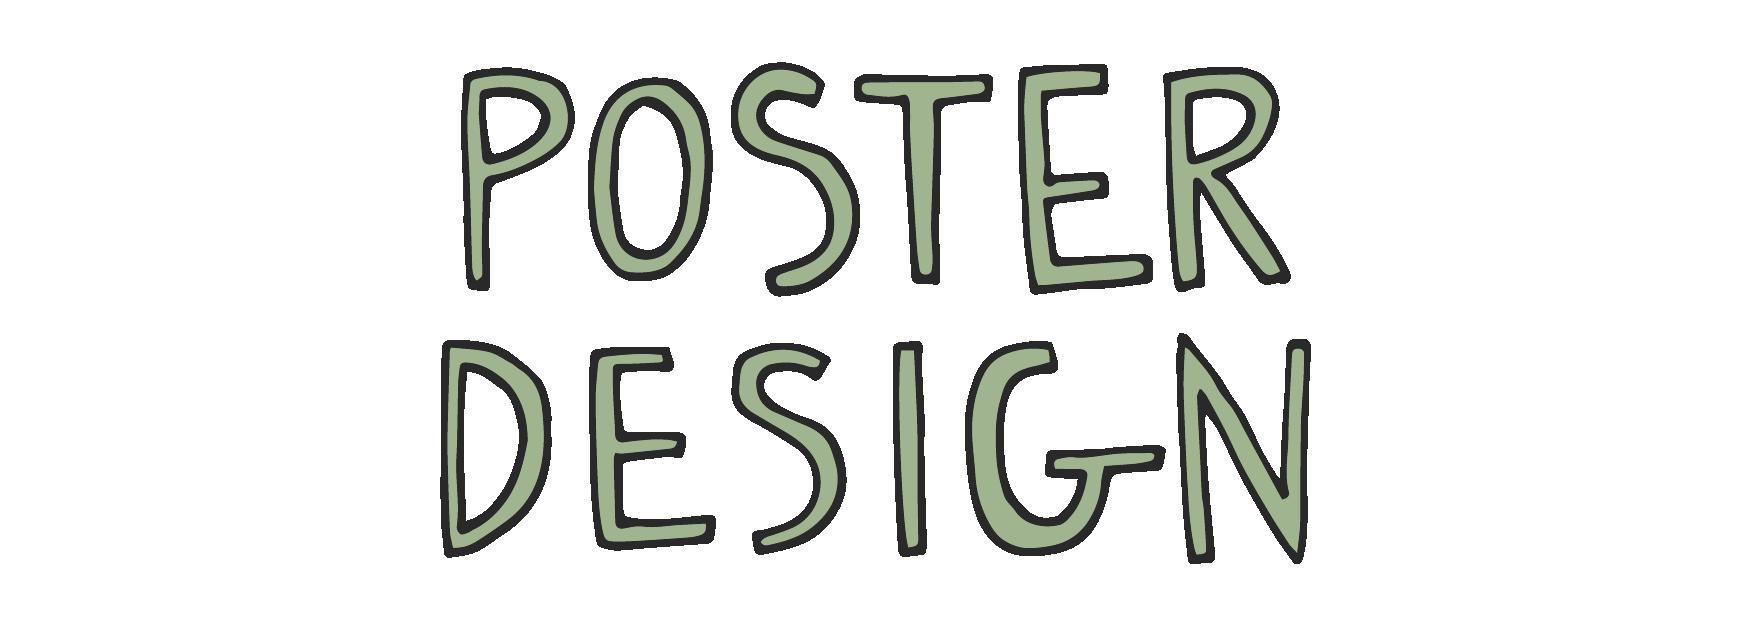 POSTER DESIGN.png